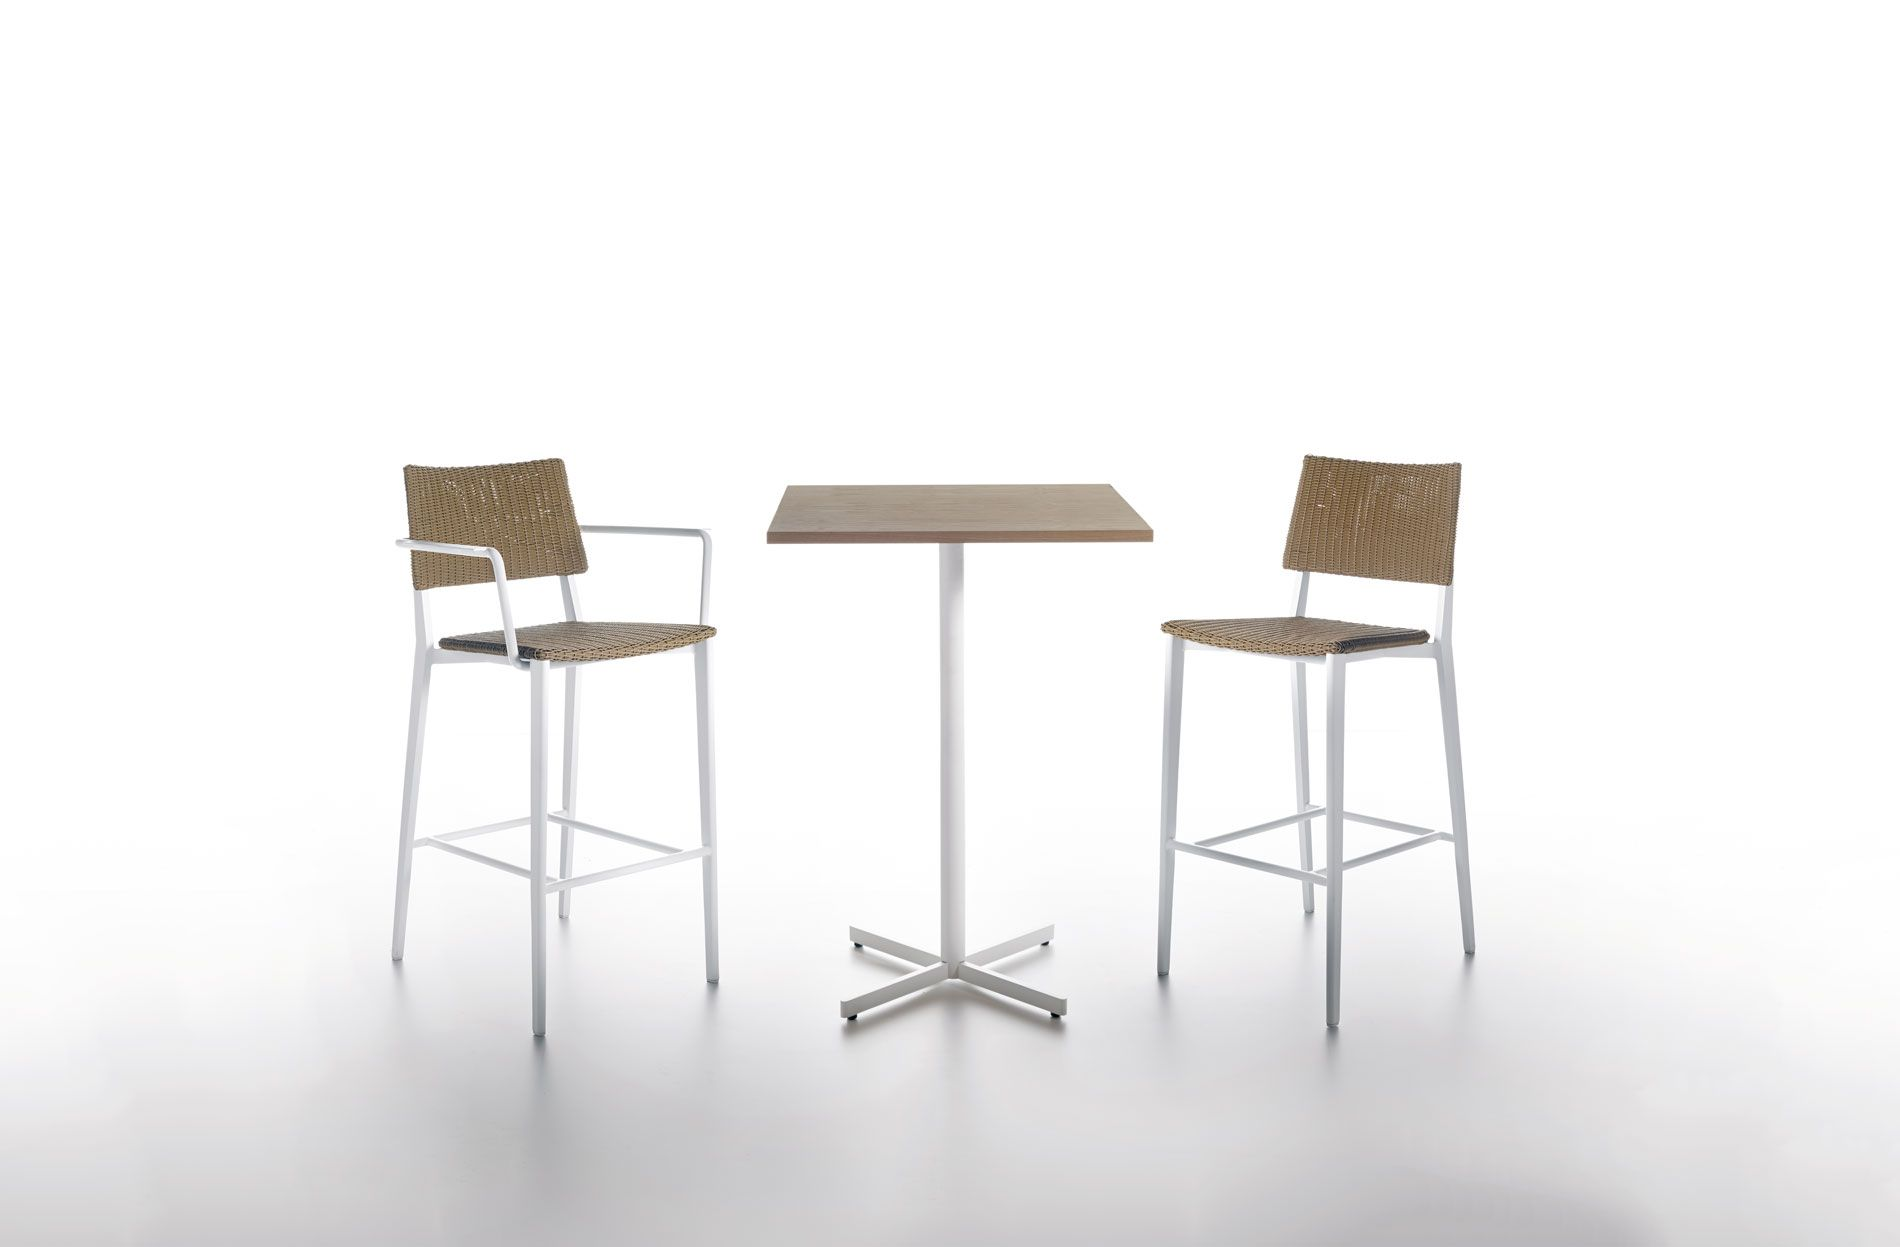 Table De Jardin Triconfort > Triconfort Triconfort Riba Barstool Furnish Out Pinterest